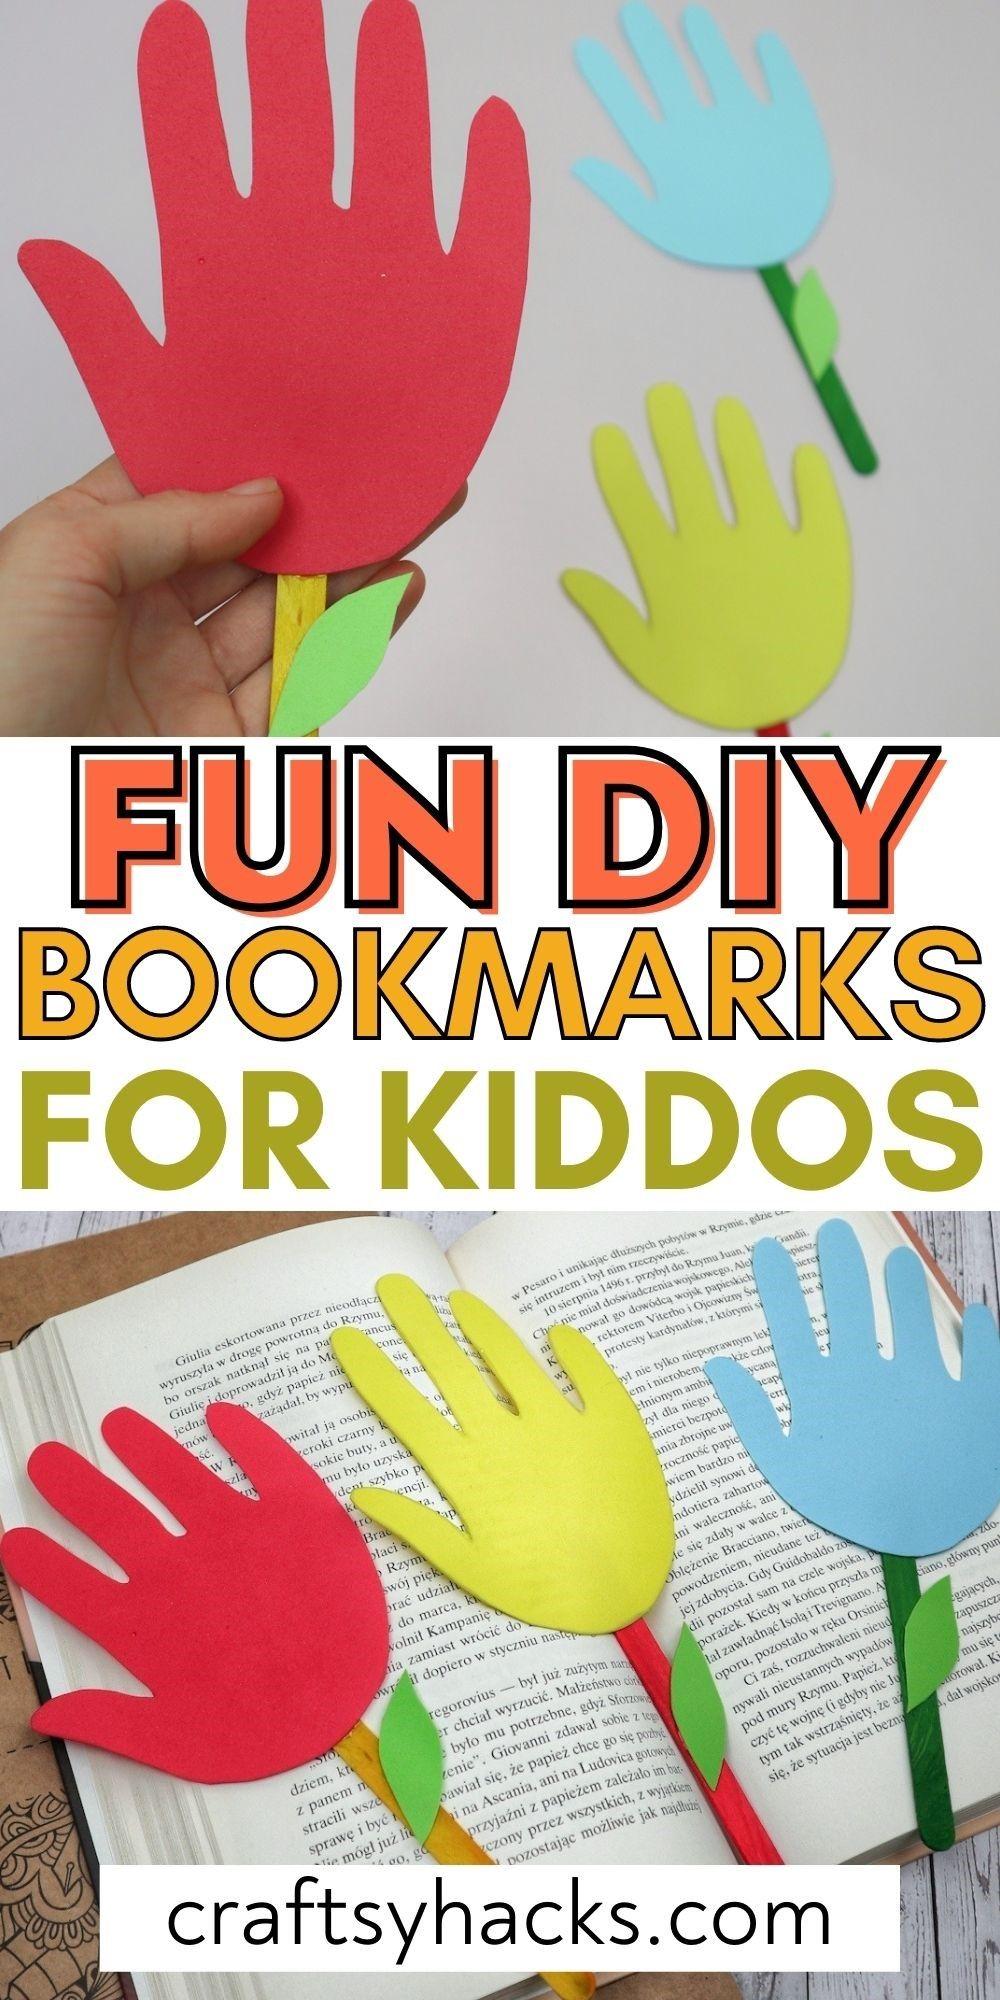 fun diy bookmarks for kiddos pin